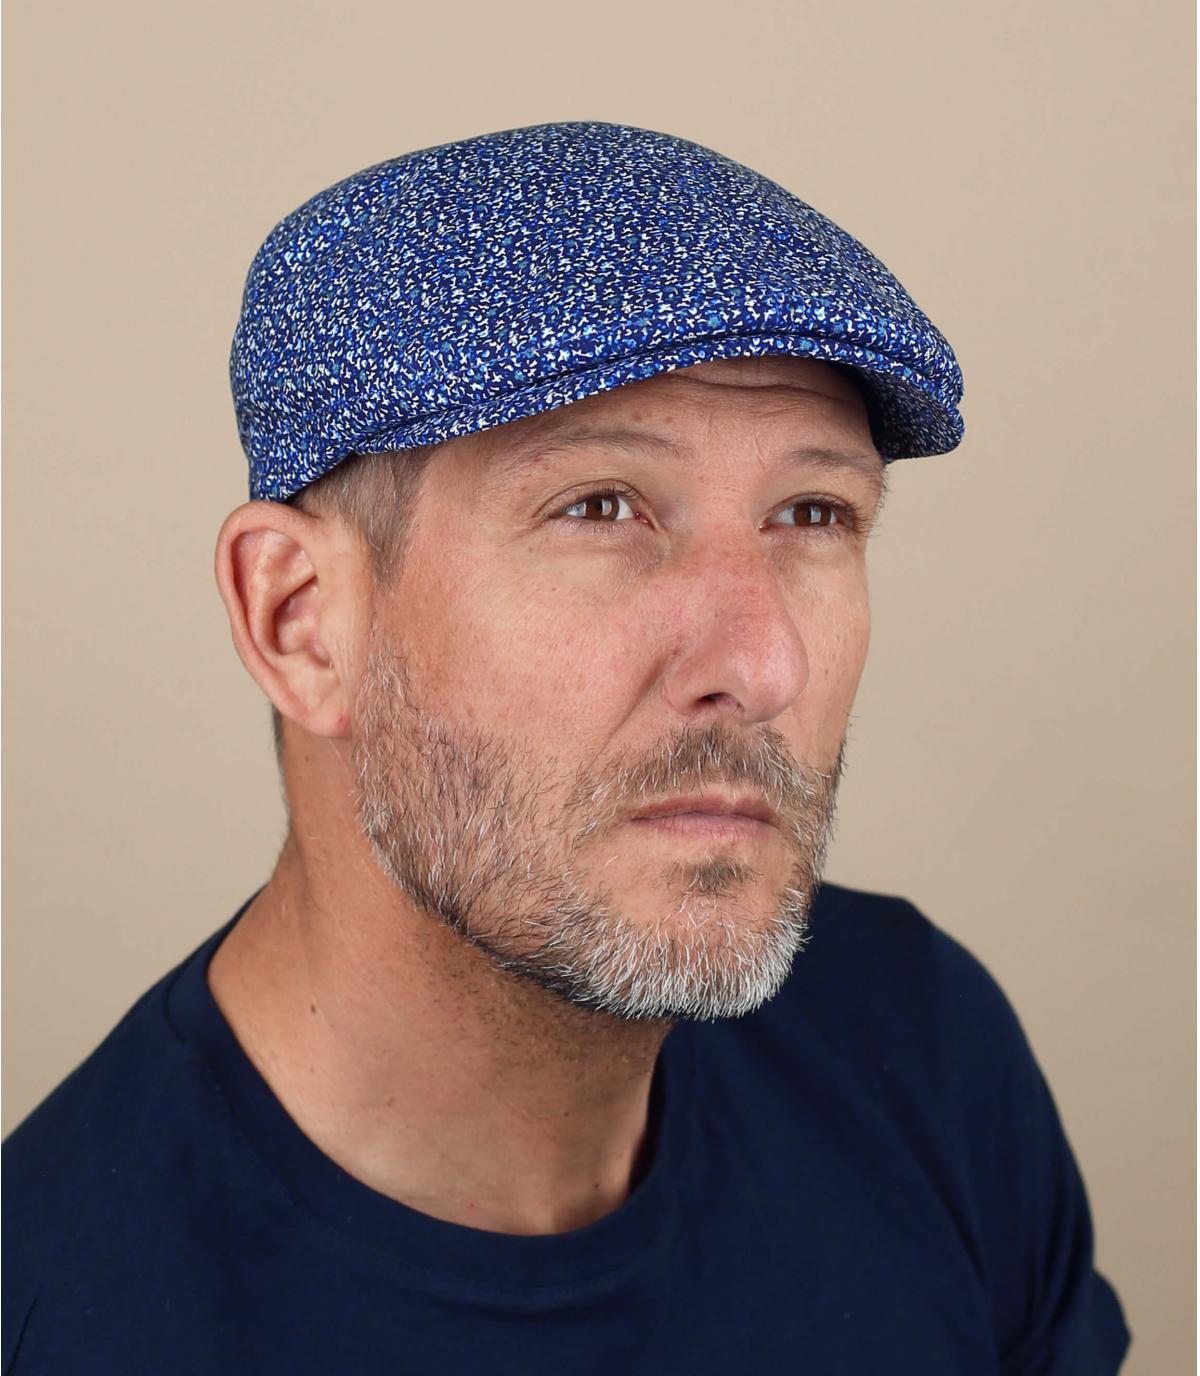 berretto blu chiné